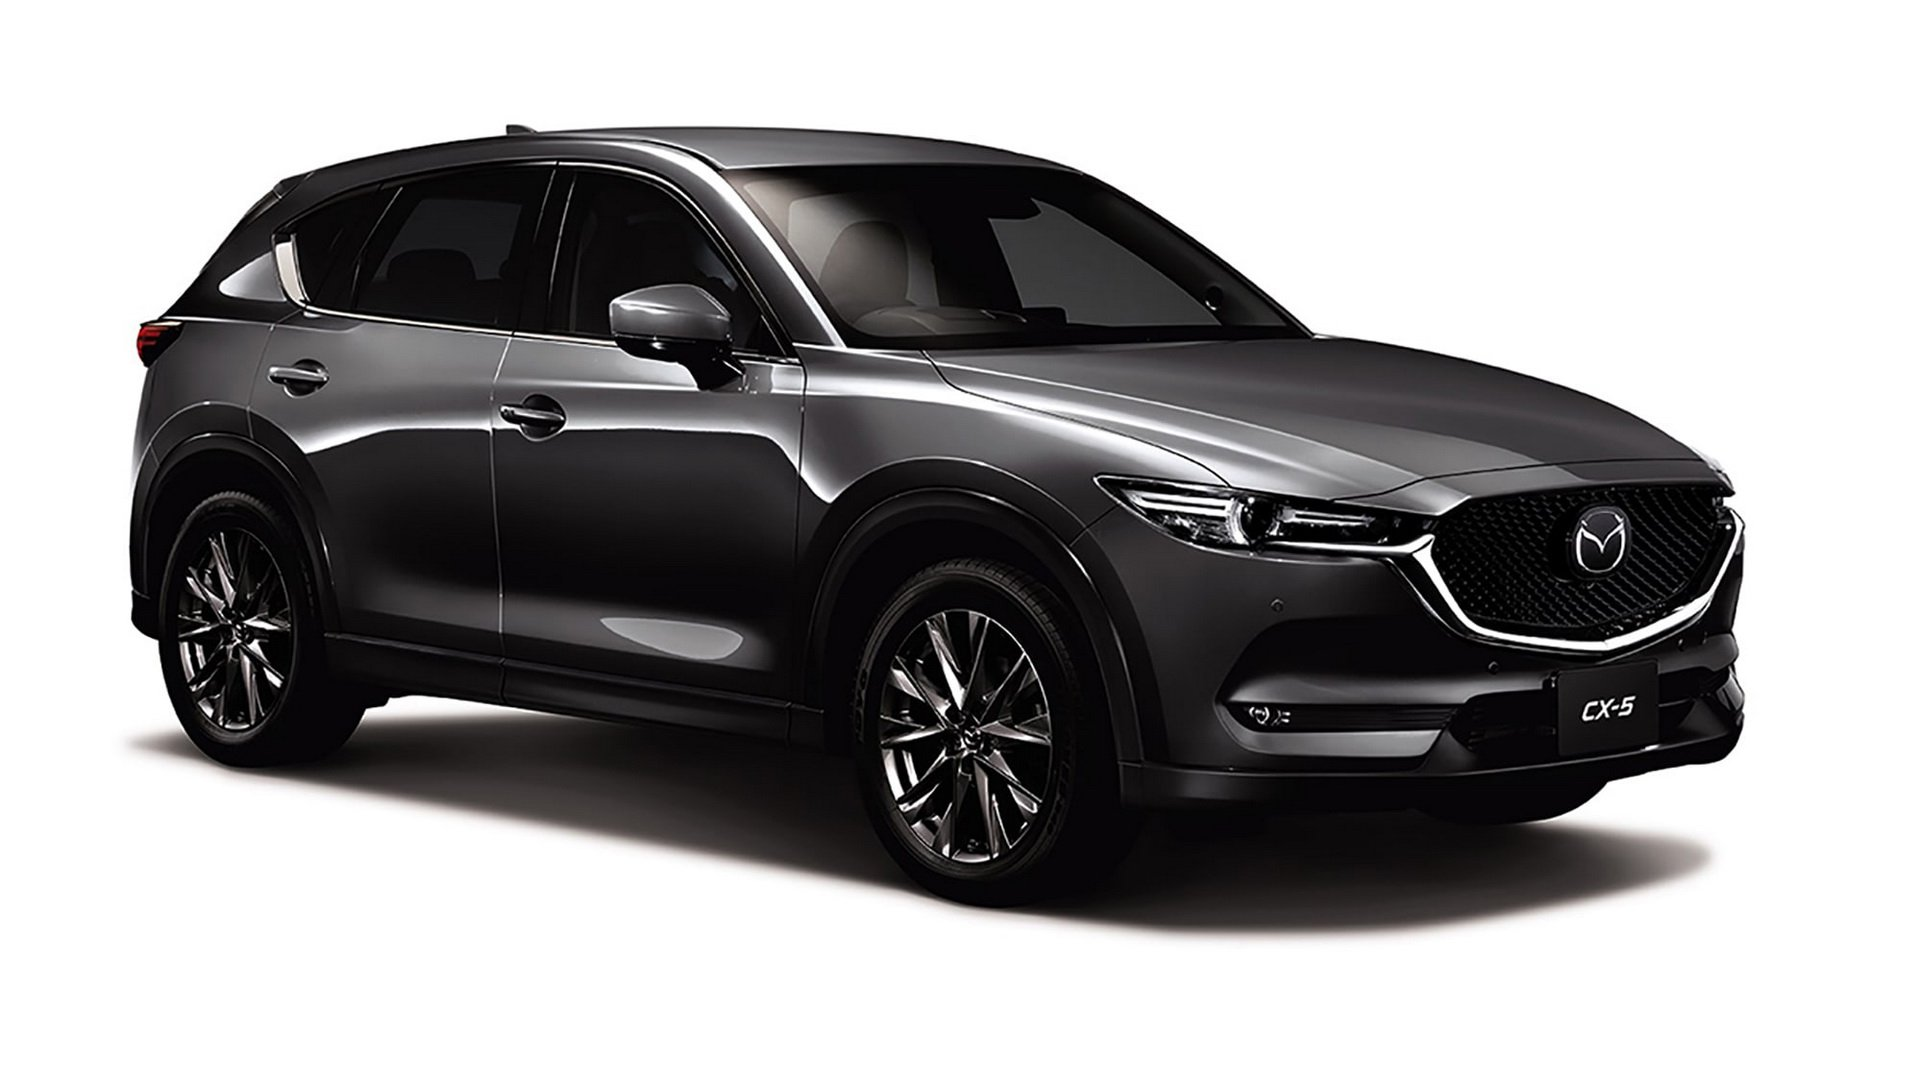 Mazda CX-5 Model Year 2019